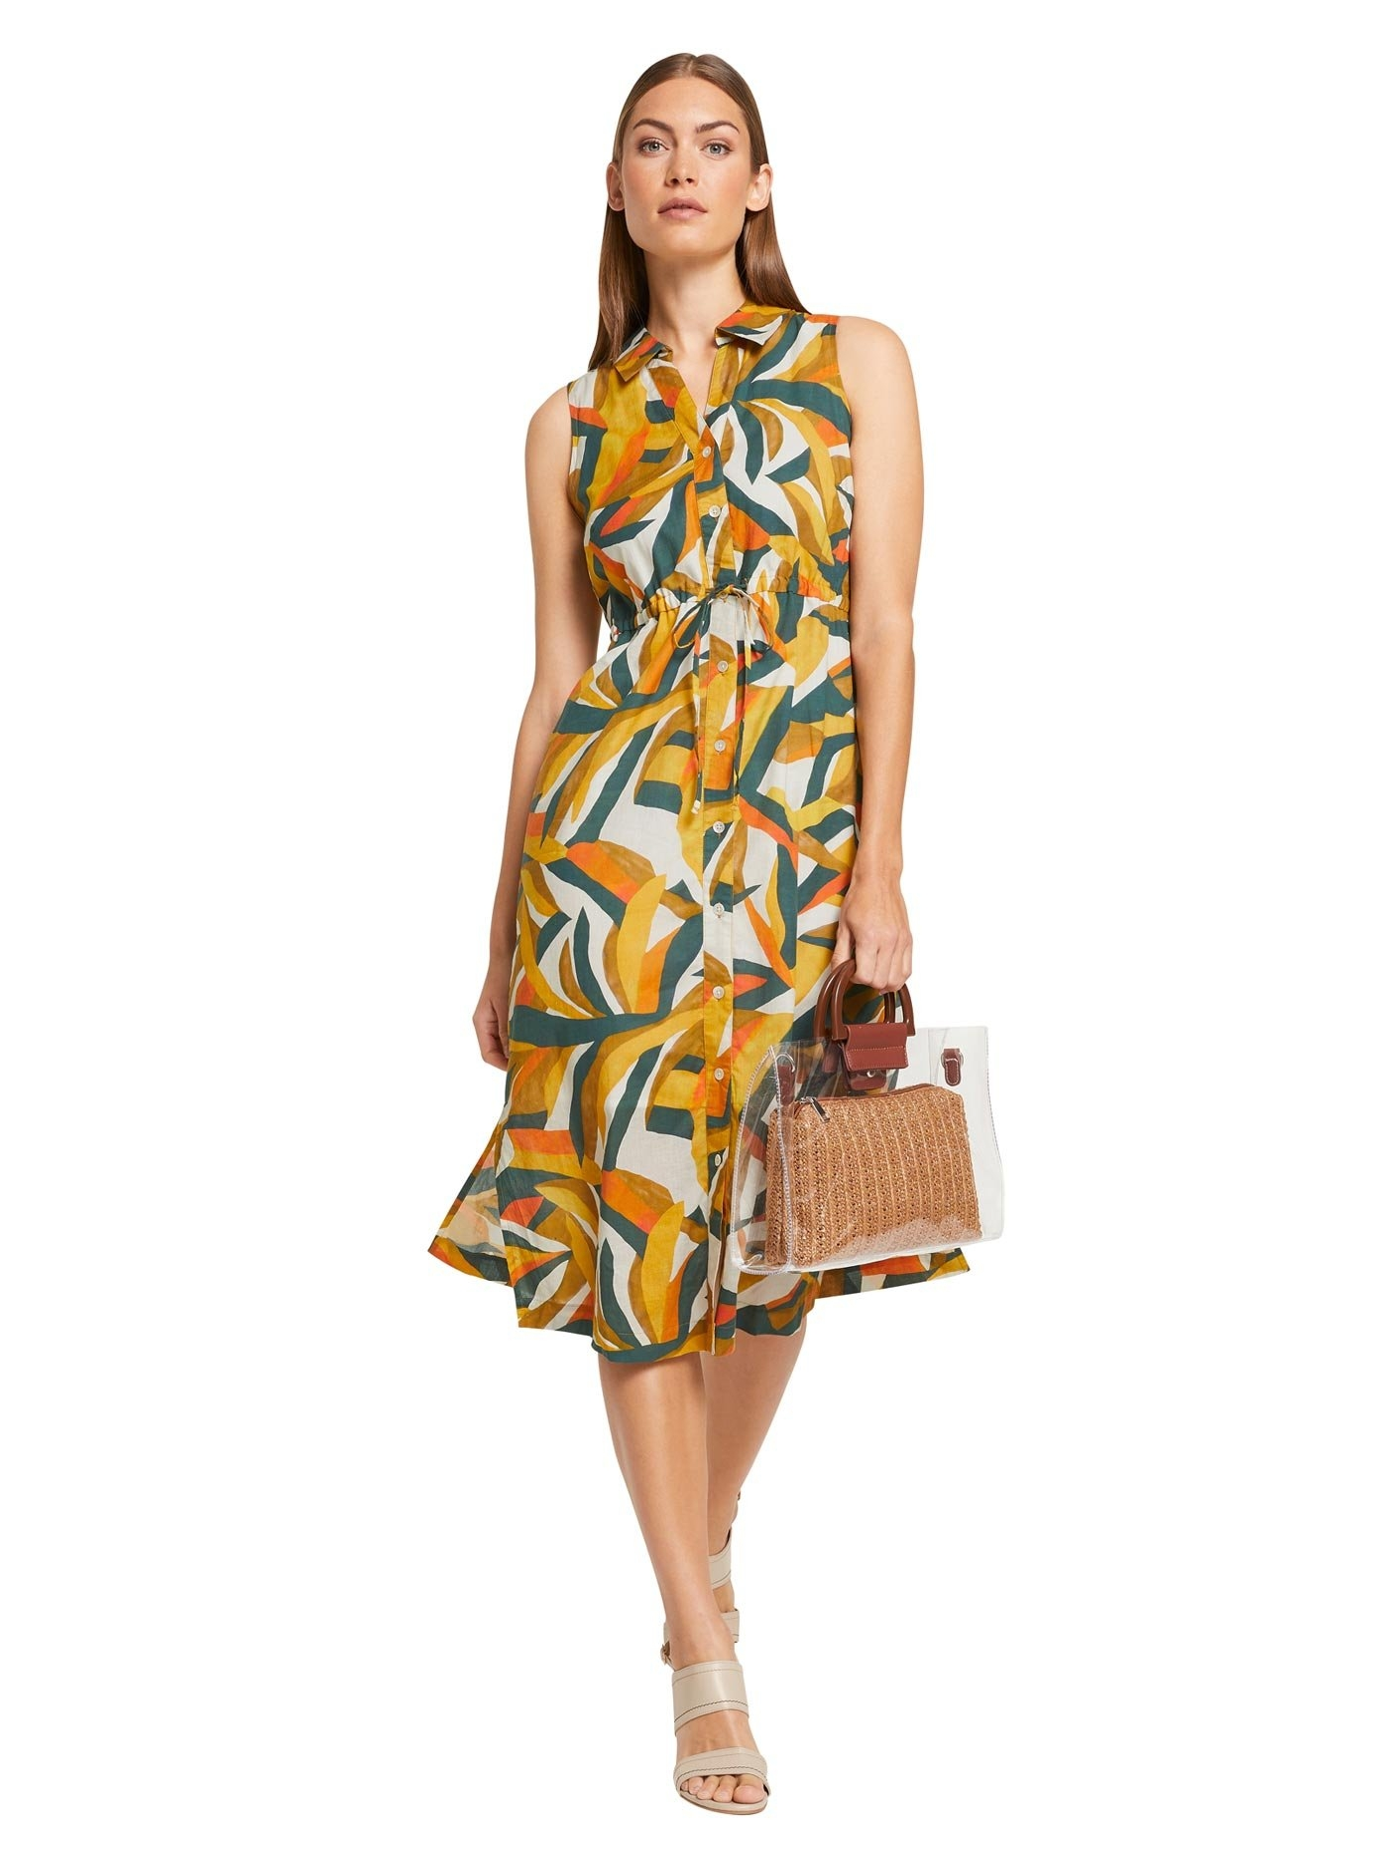 RICK CARDONA by Heine jurk met overhemdkraag Gedessineerde jurk veilig op otto.nl kopen